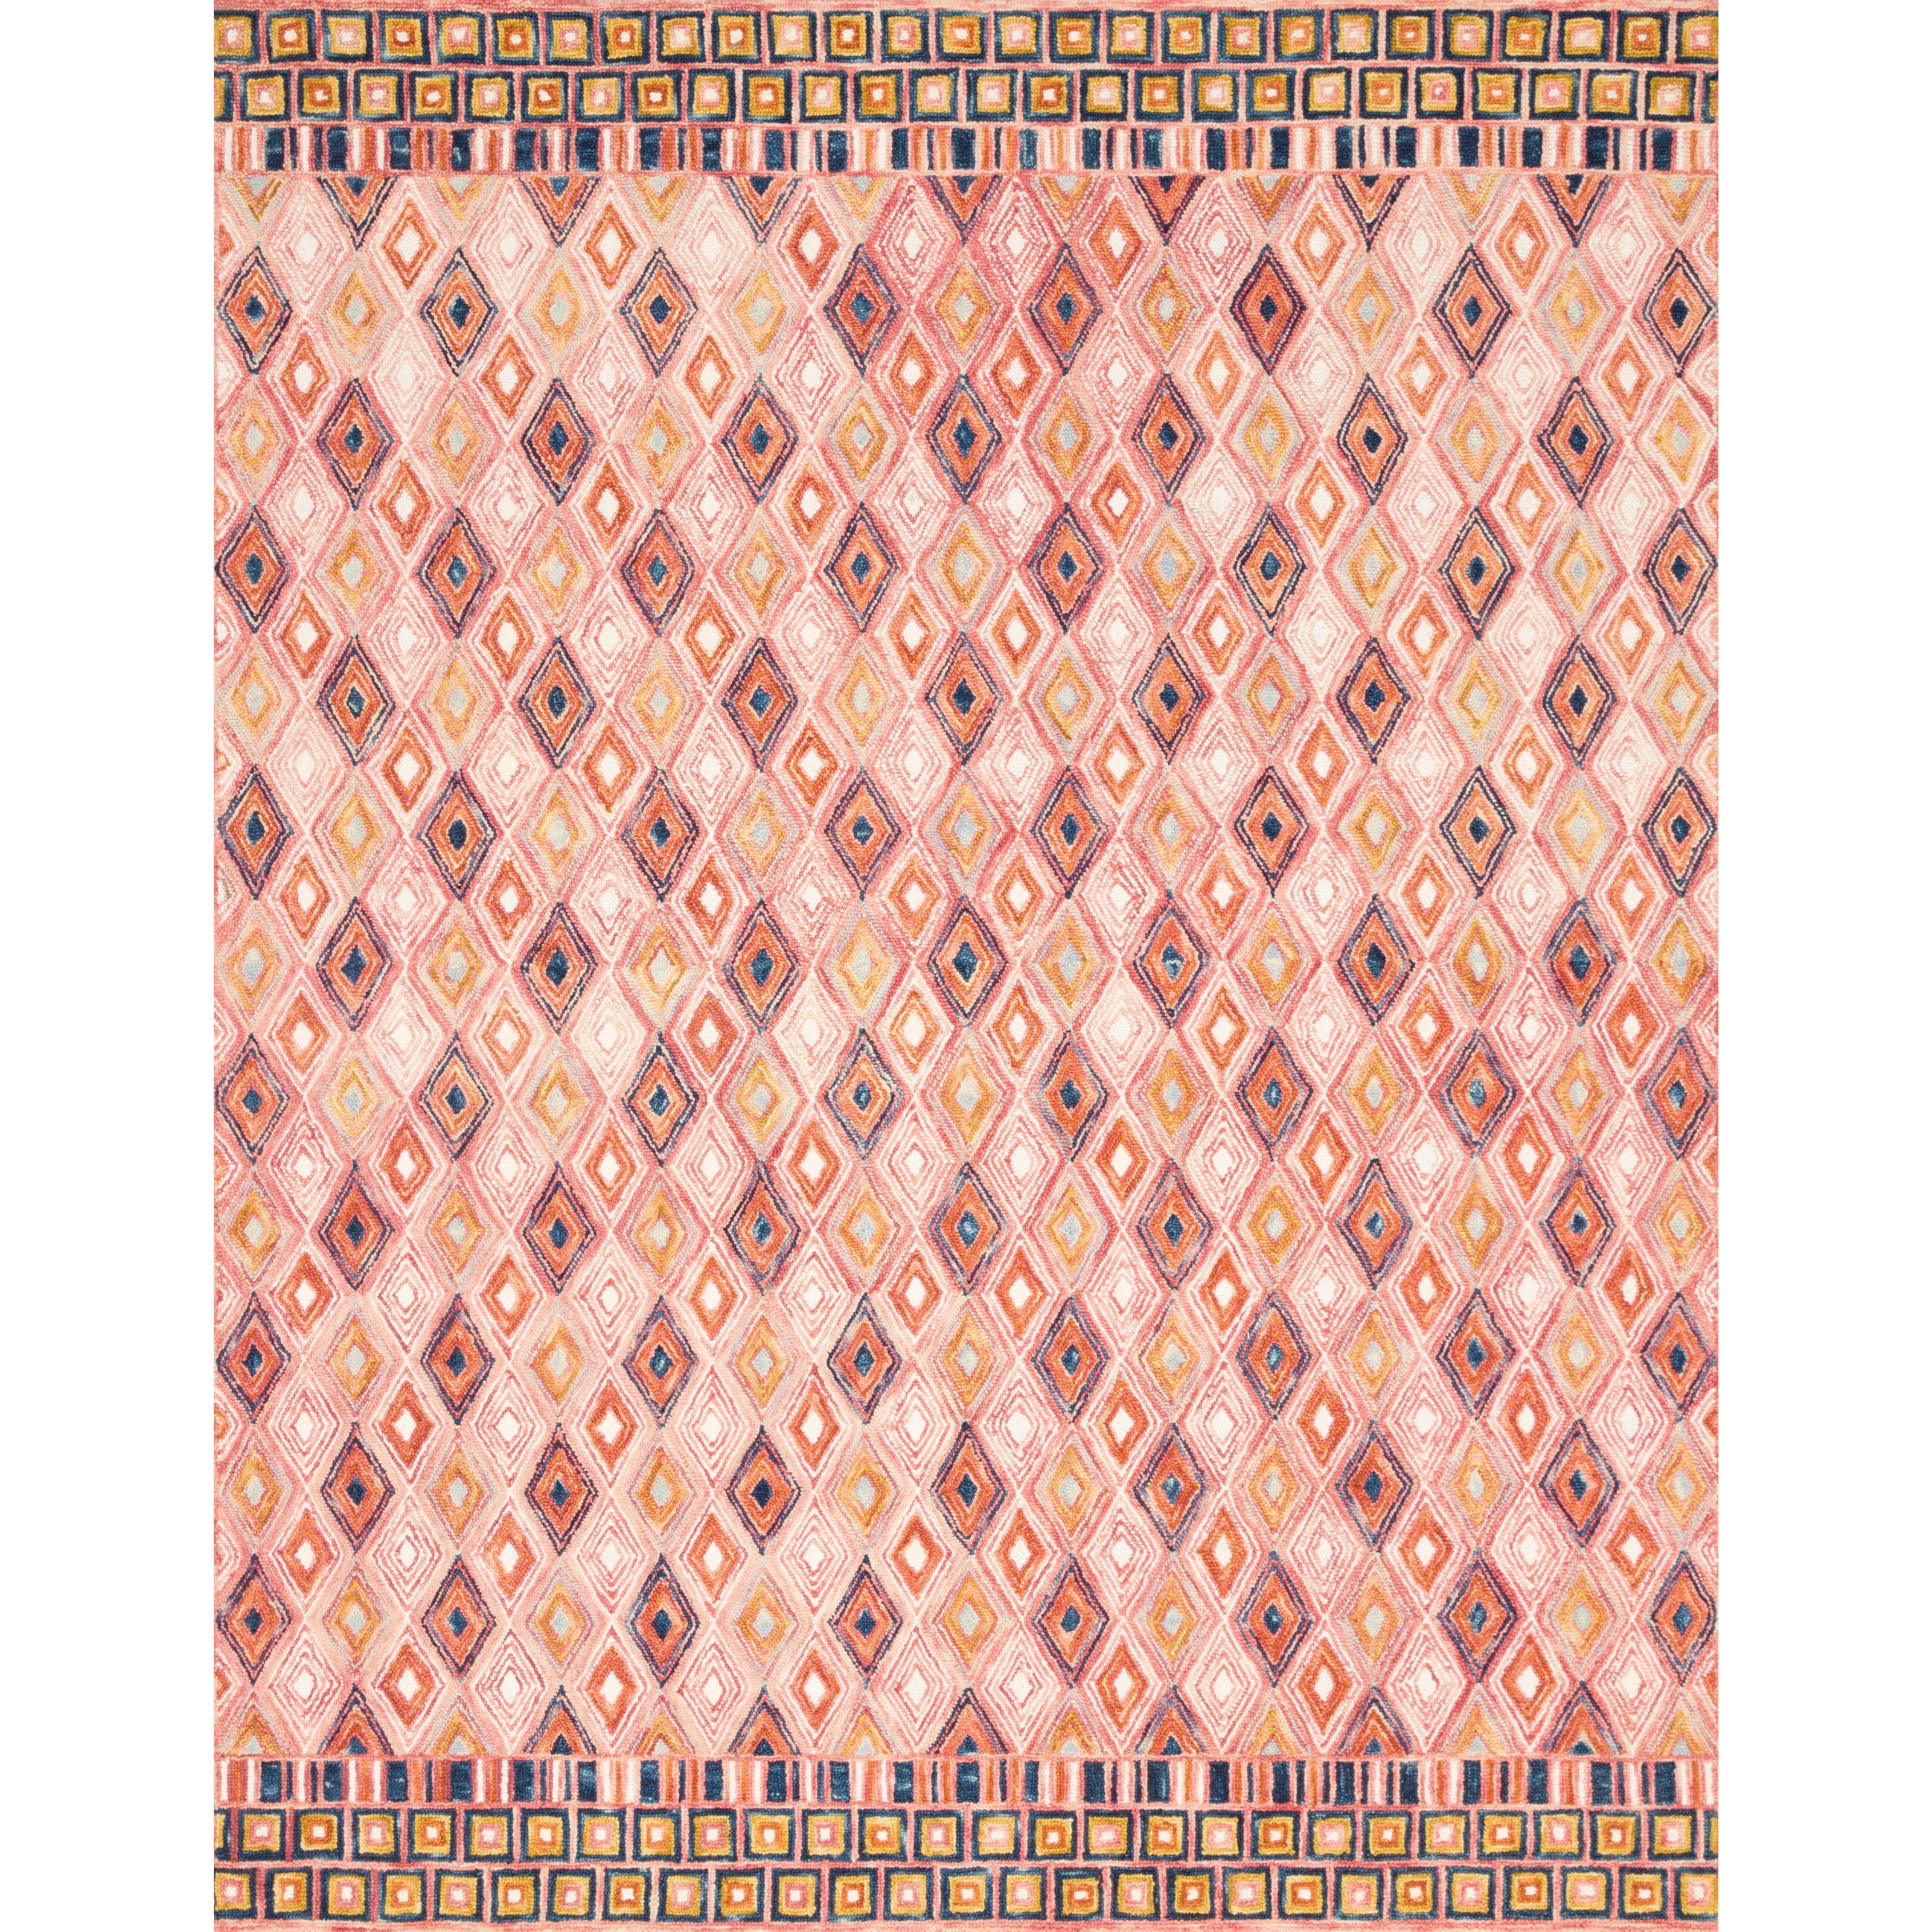 "Priti 1'6"" x 1'6""  Pink / Sunset Rug by Loloi Rugs at Virginia Furniture Market"